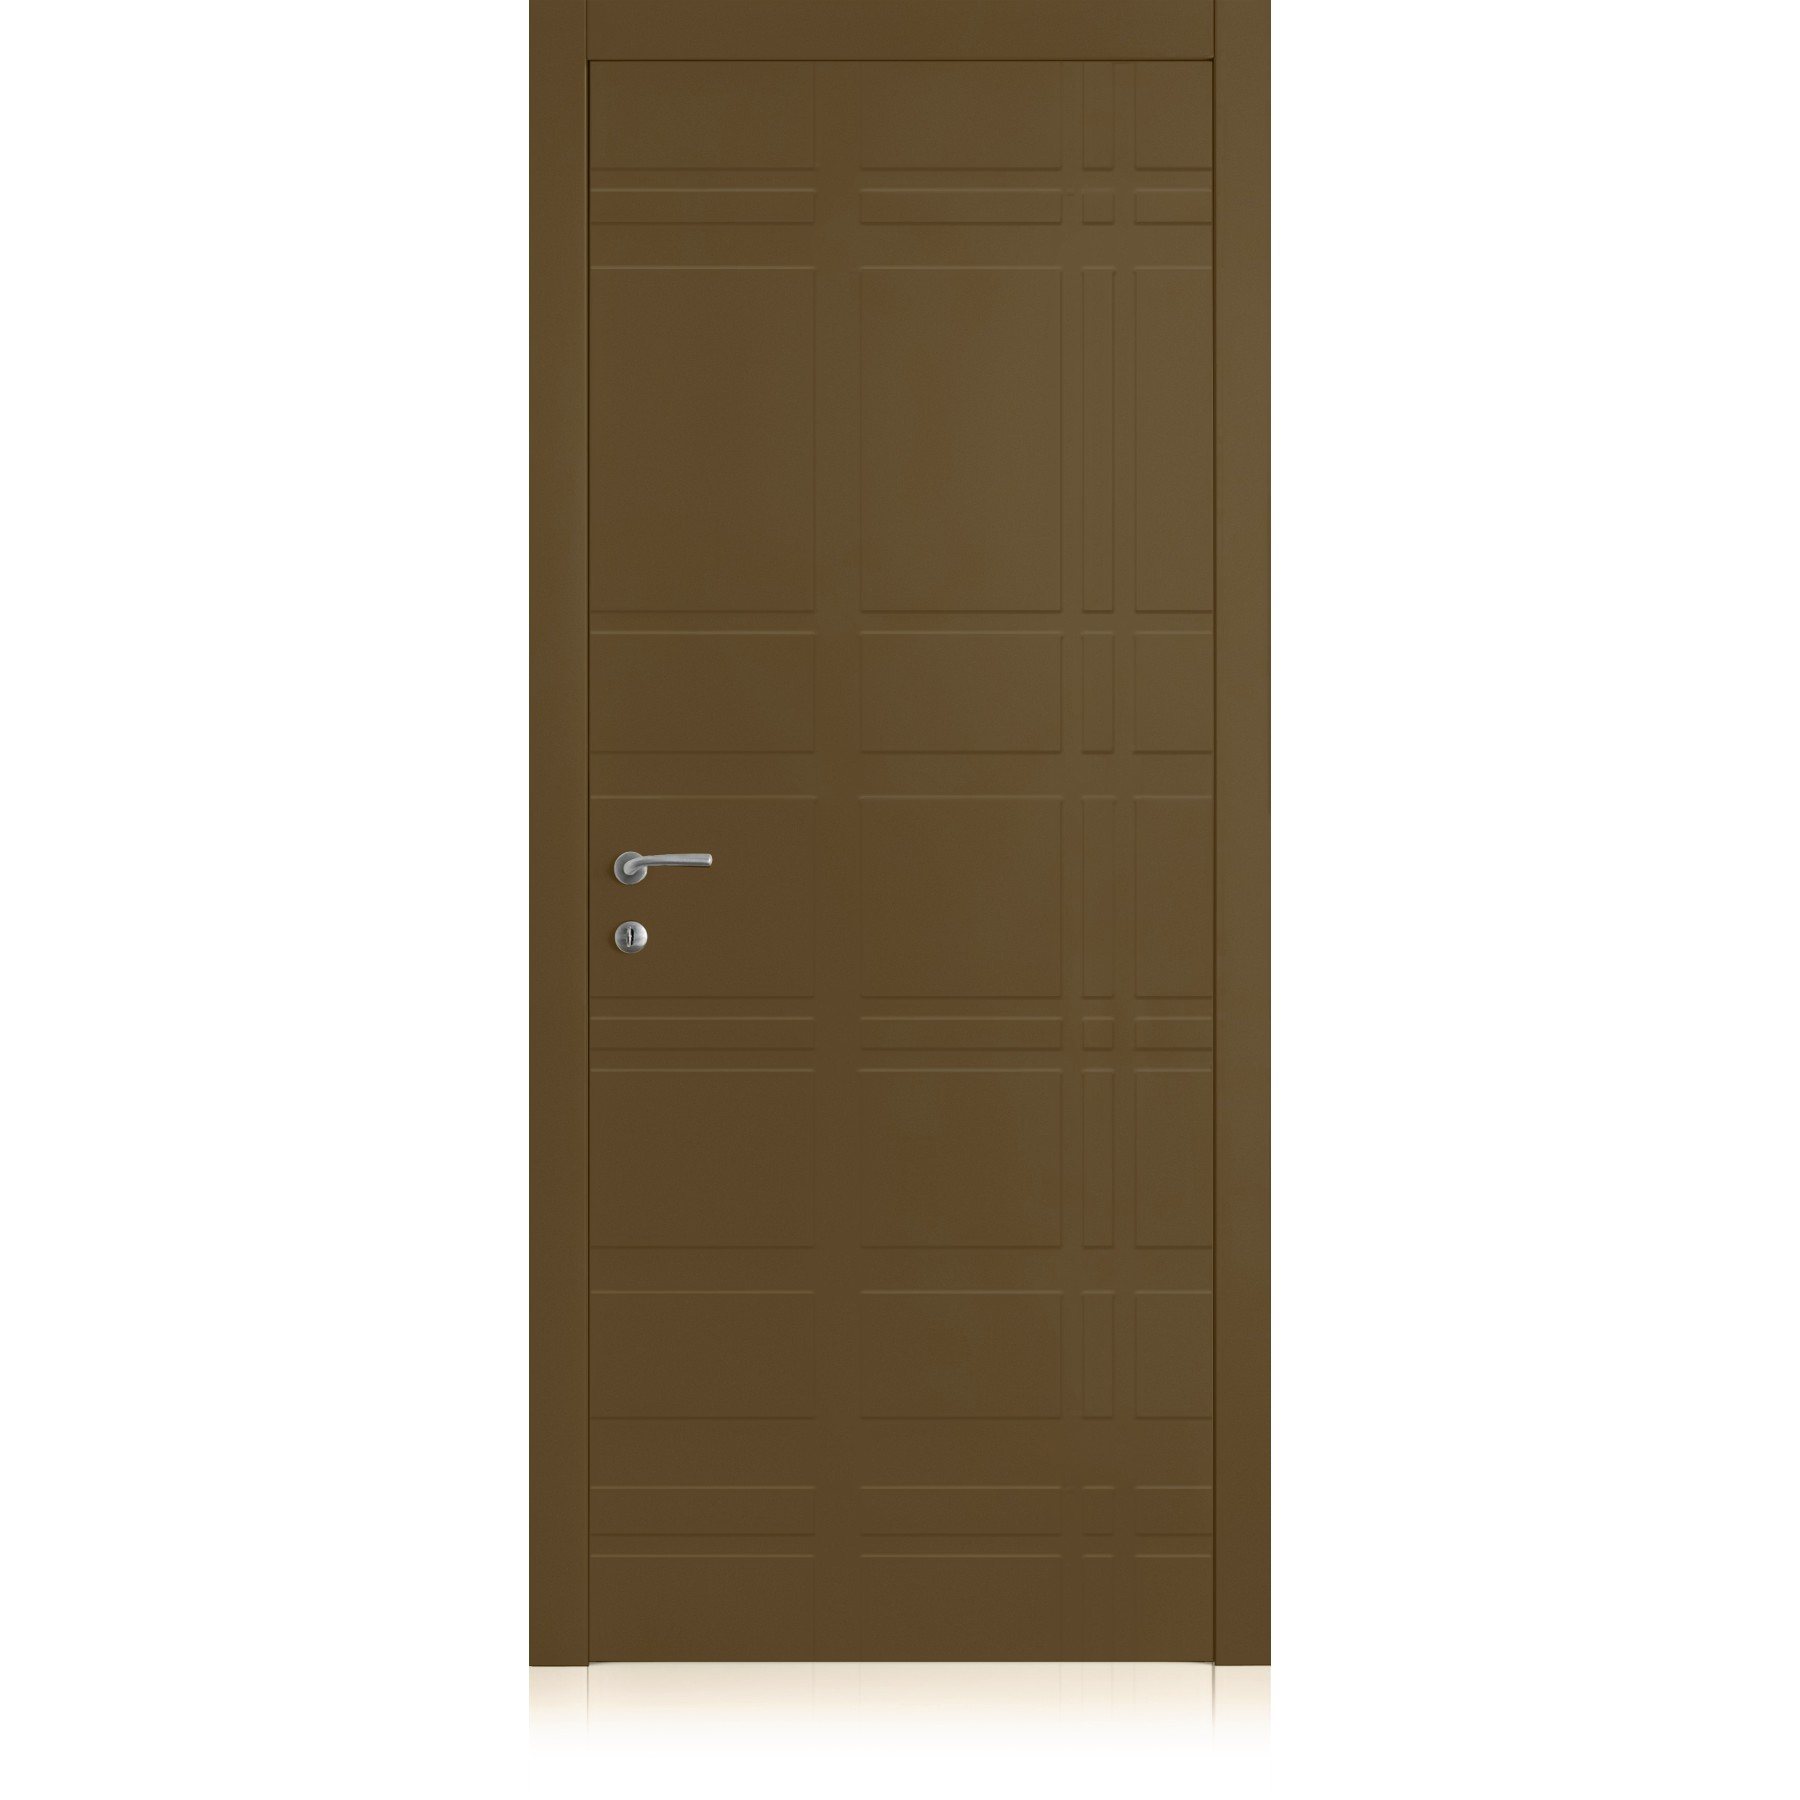 Yncisa Tartan Terra Pure Laccato ULTRAopaco door